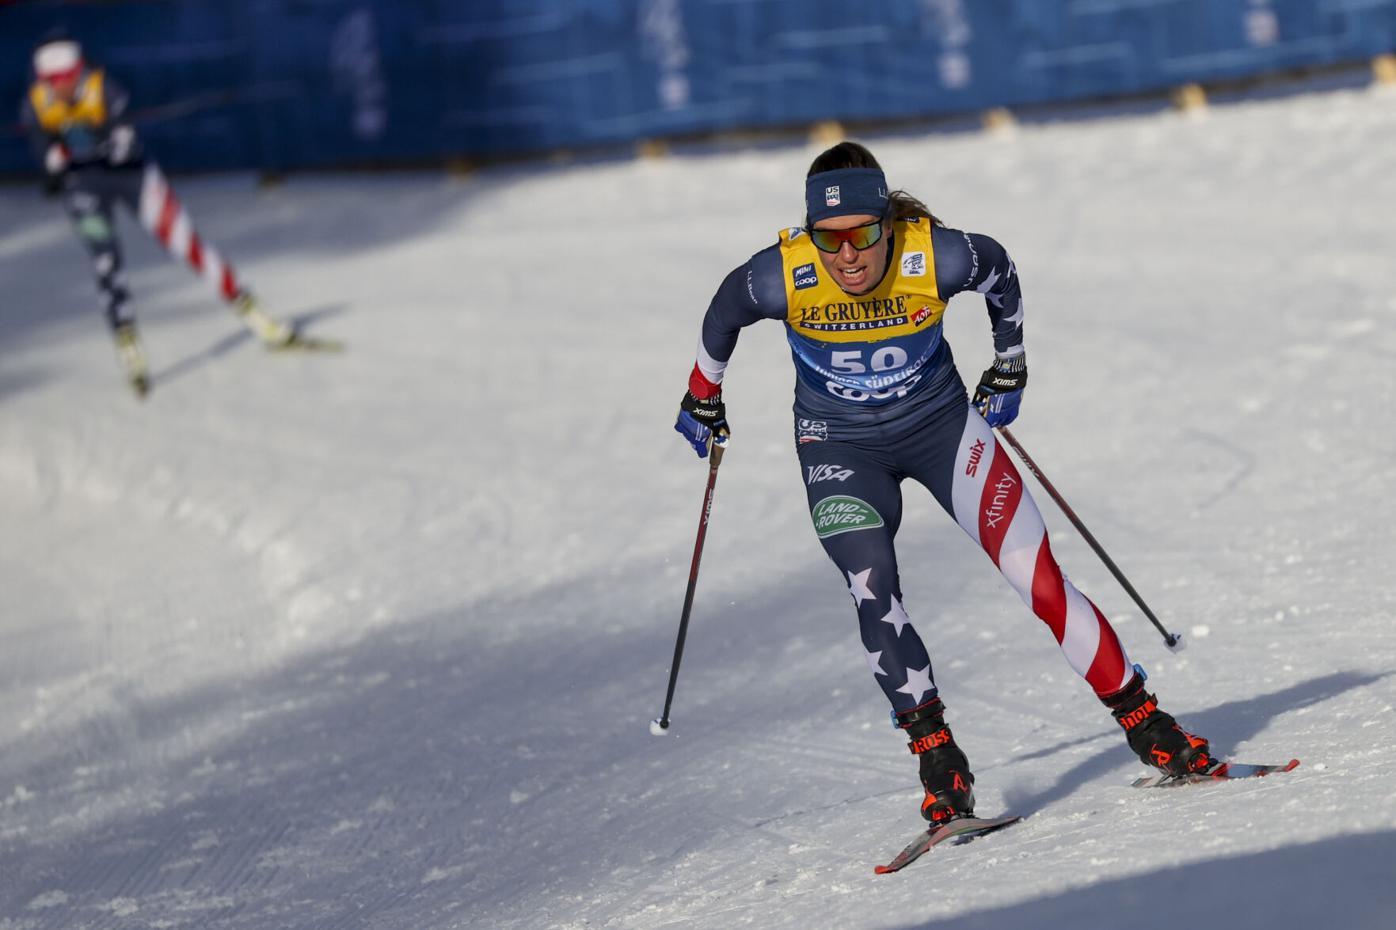 Italy Cross Country Tour de Ski